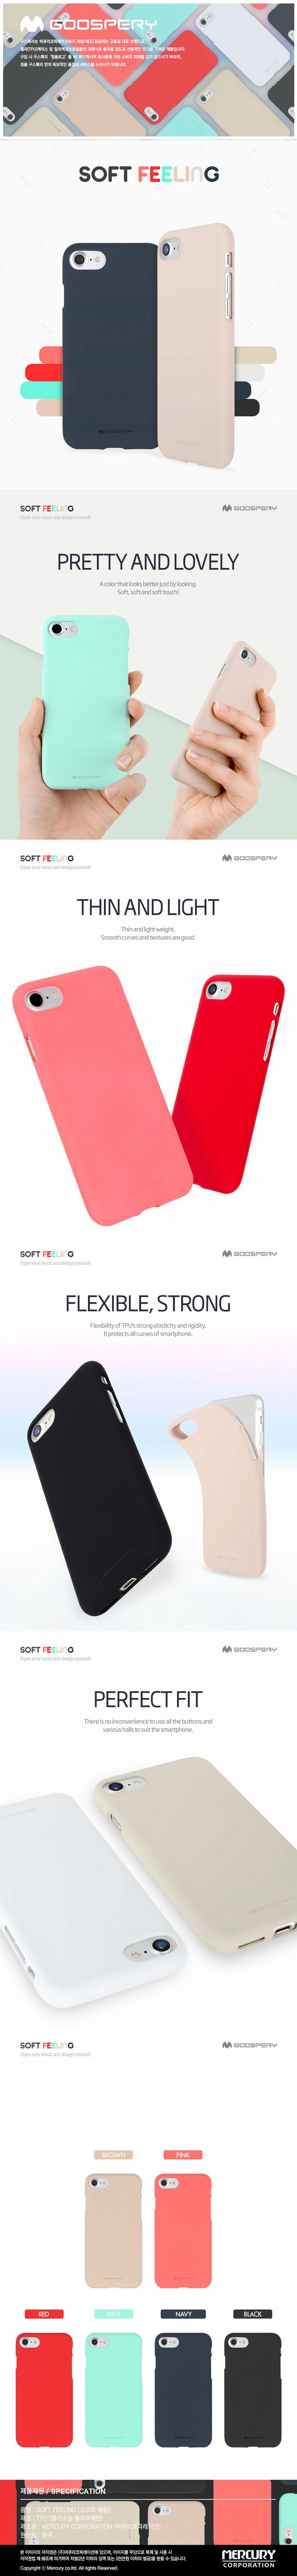 Buy Pride Clear Jelly Casegalaxy S9 Plus S8 Note 8 Iphone X 7 6 Goospery Samsung Galaxy New Bumper Case Black 1 Soft Feeling